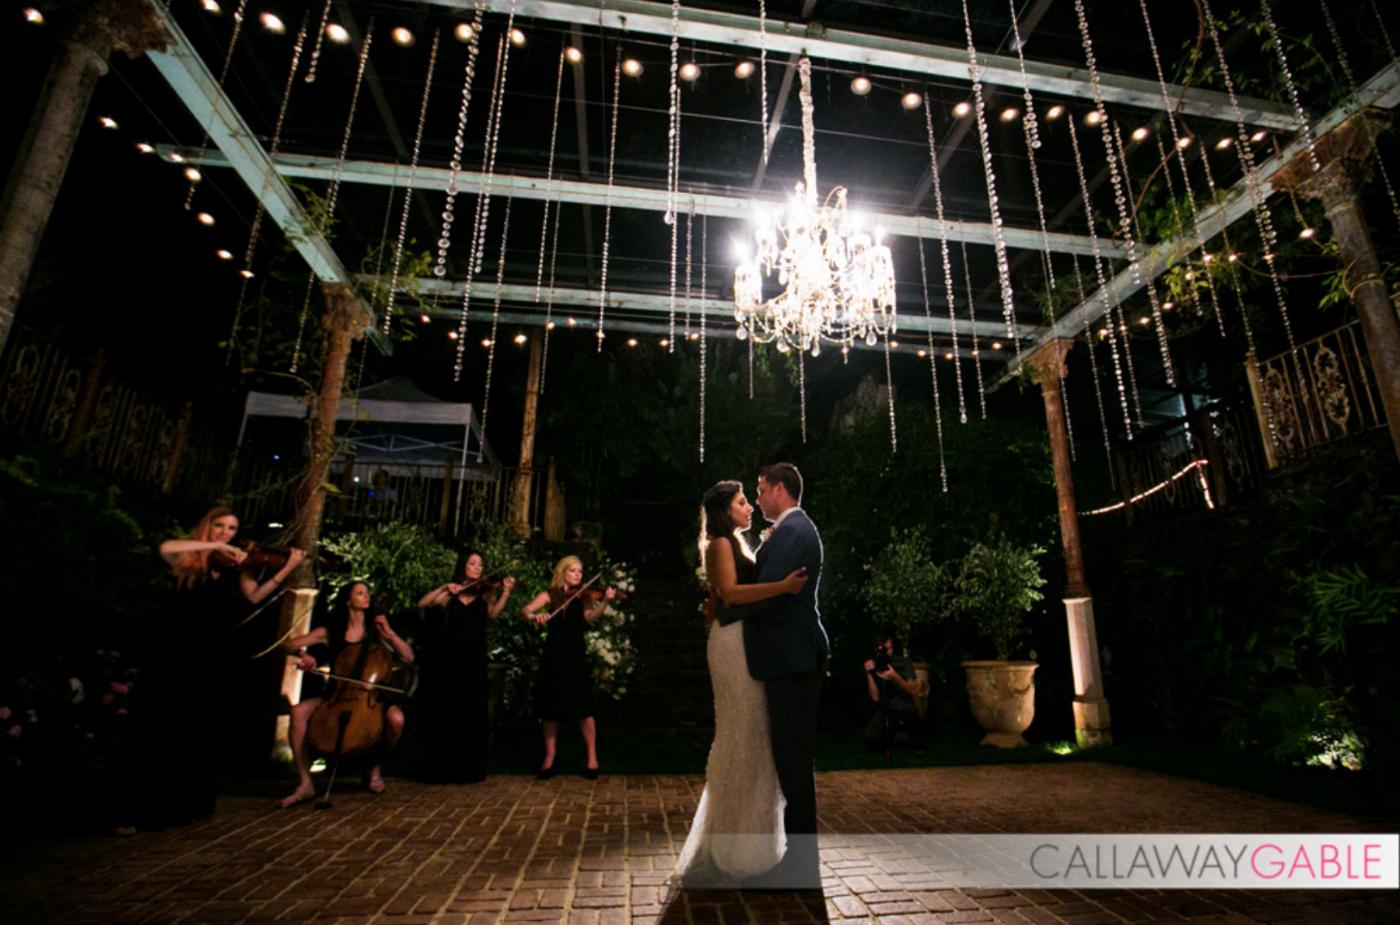 los-angeles-wedding-music-ceremony-first-dance-string-quartet-violin-viola-cello-orange-county-maui-4.png